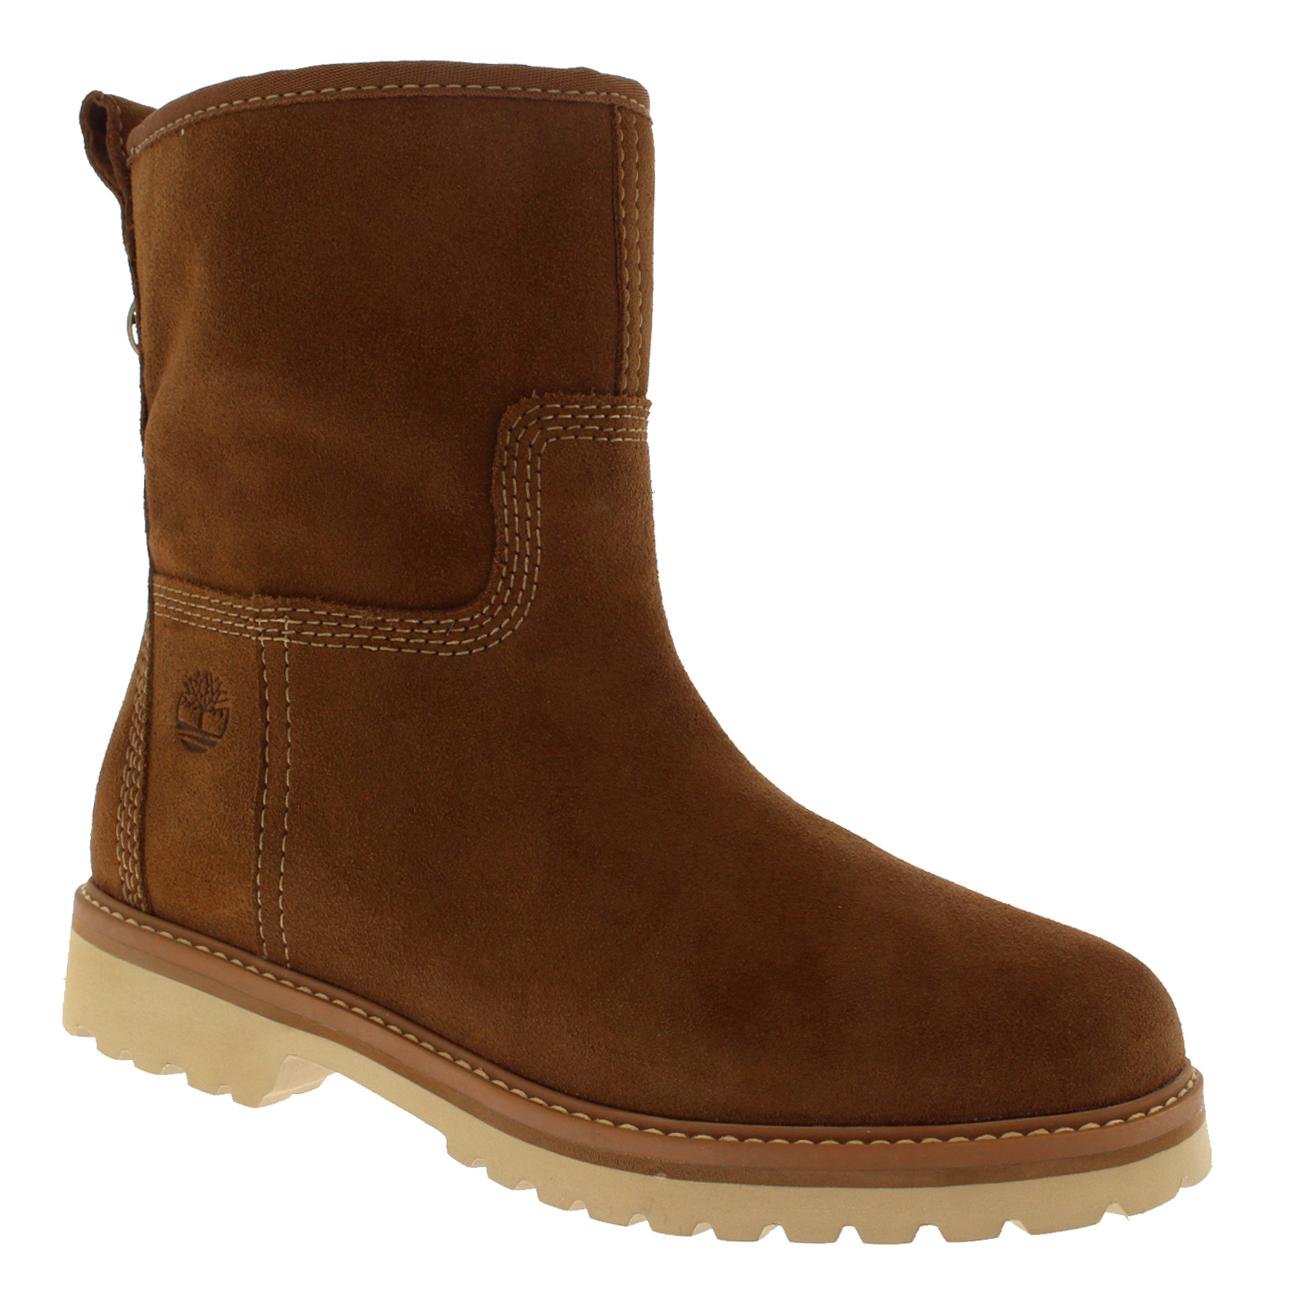 abe1caeb334be Womens Timberland Chamonix Valley Winter Boot Waterproof Suede Calf ...